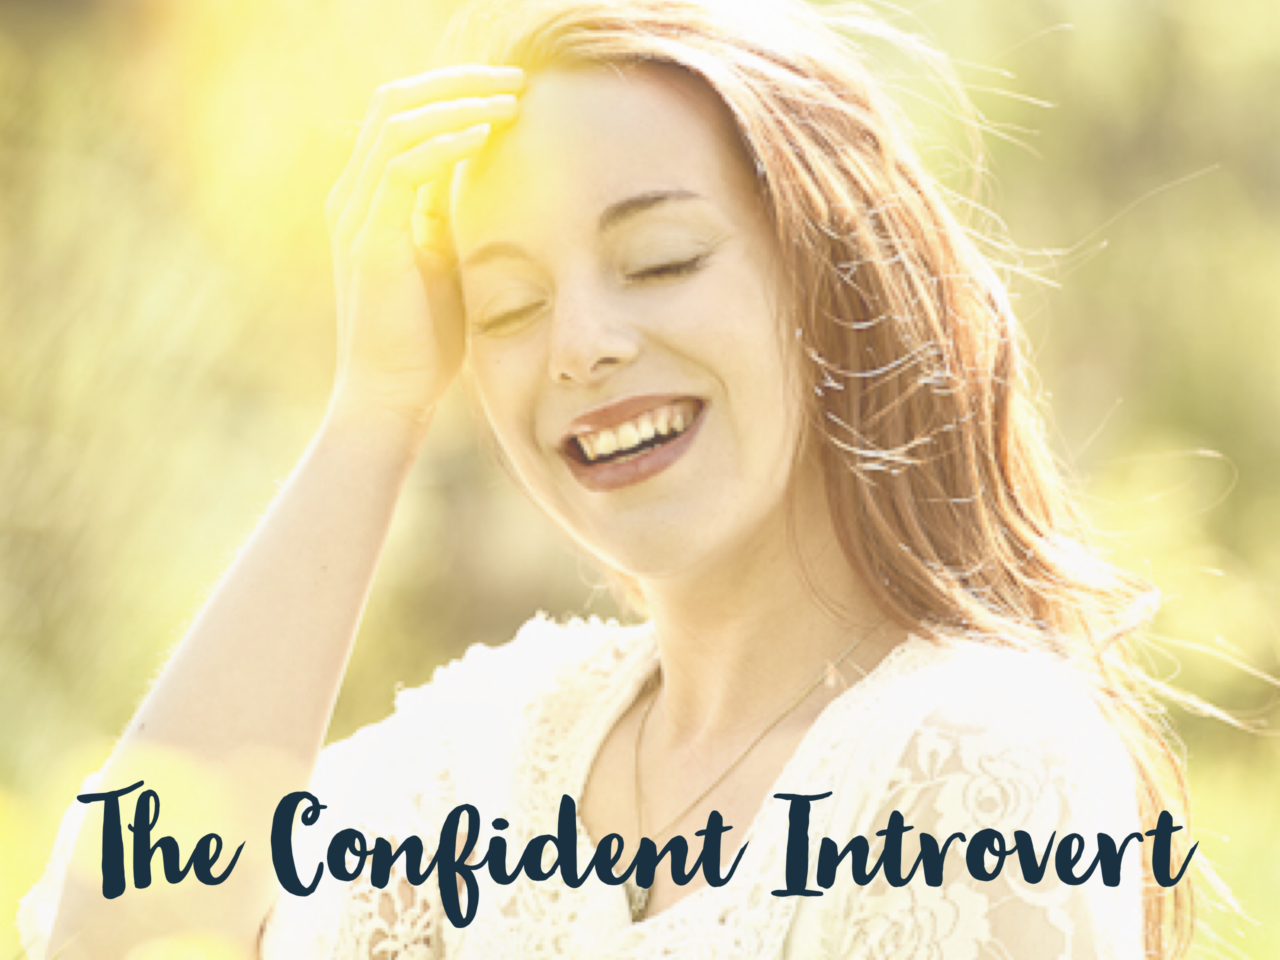 Dr. Katharina Stenger, Psychologische Onlineberatung: The Confident Introvert Onlinetraining